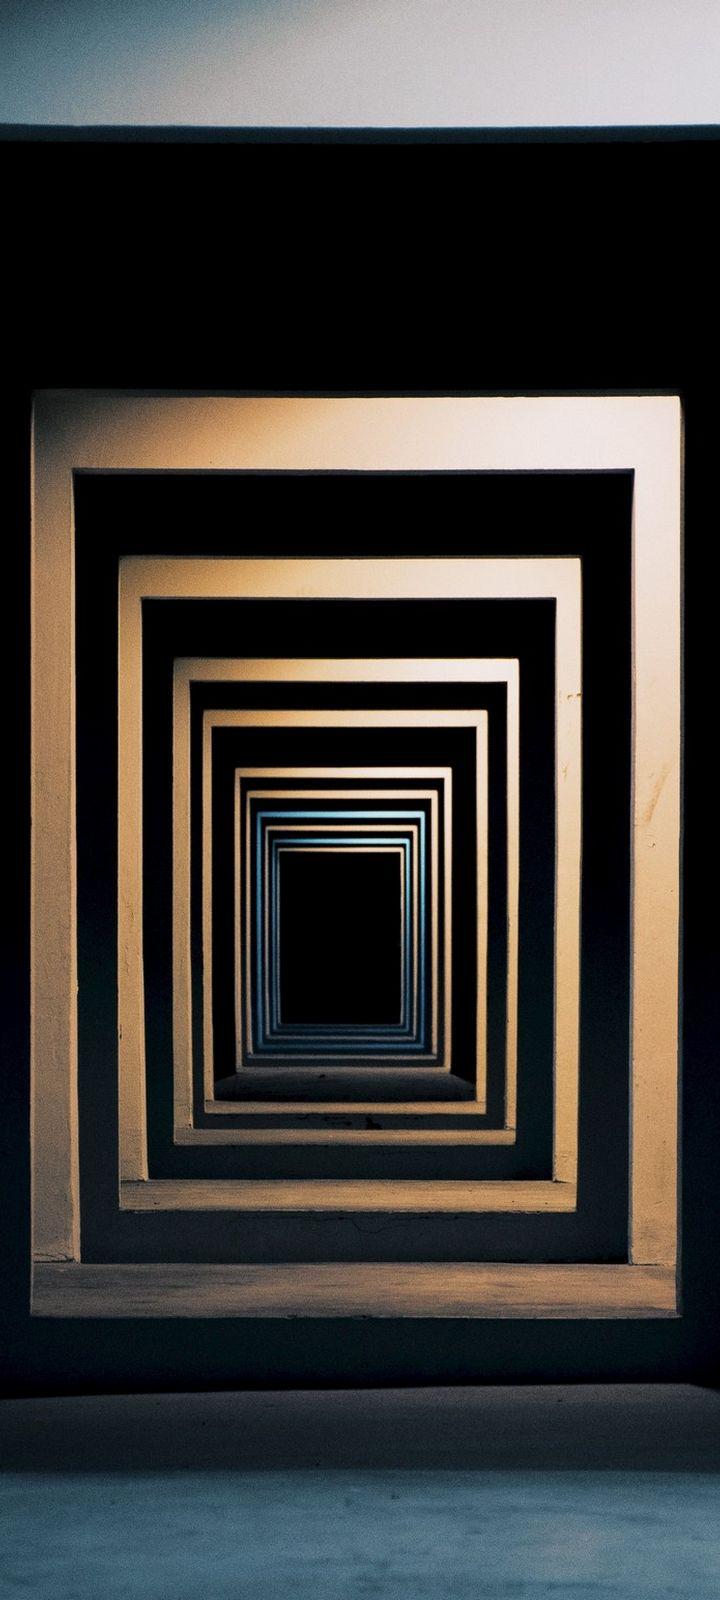 Minimalism Symmetry Space Wallpaper 720x1600